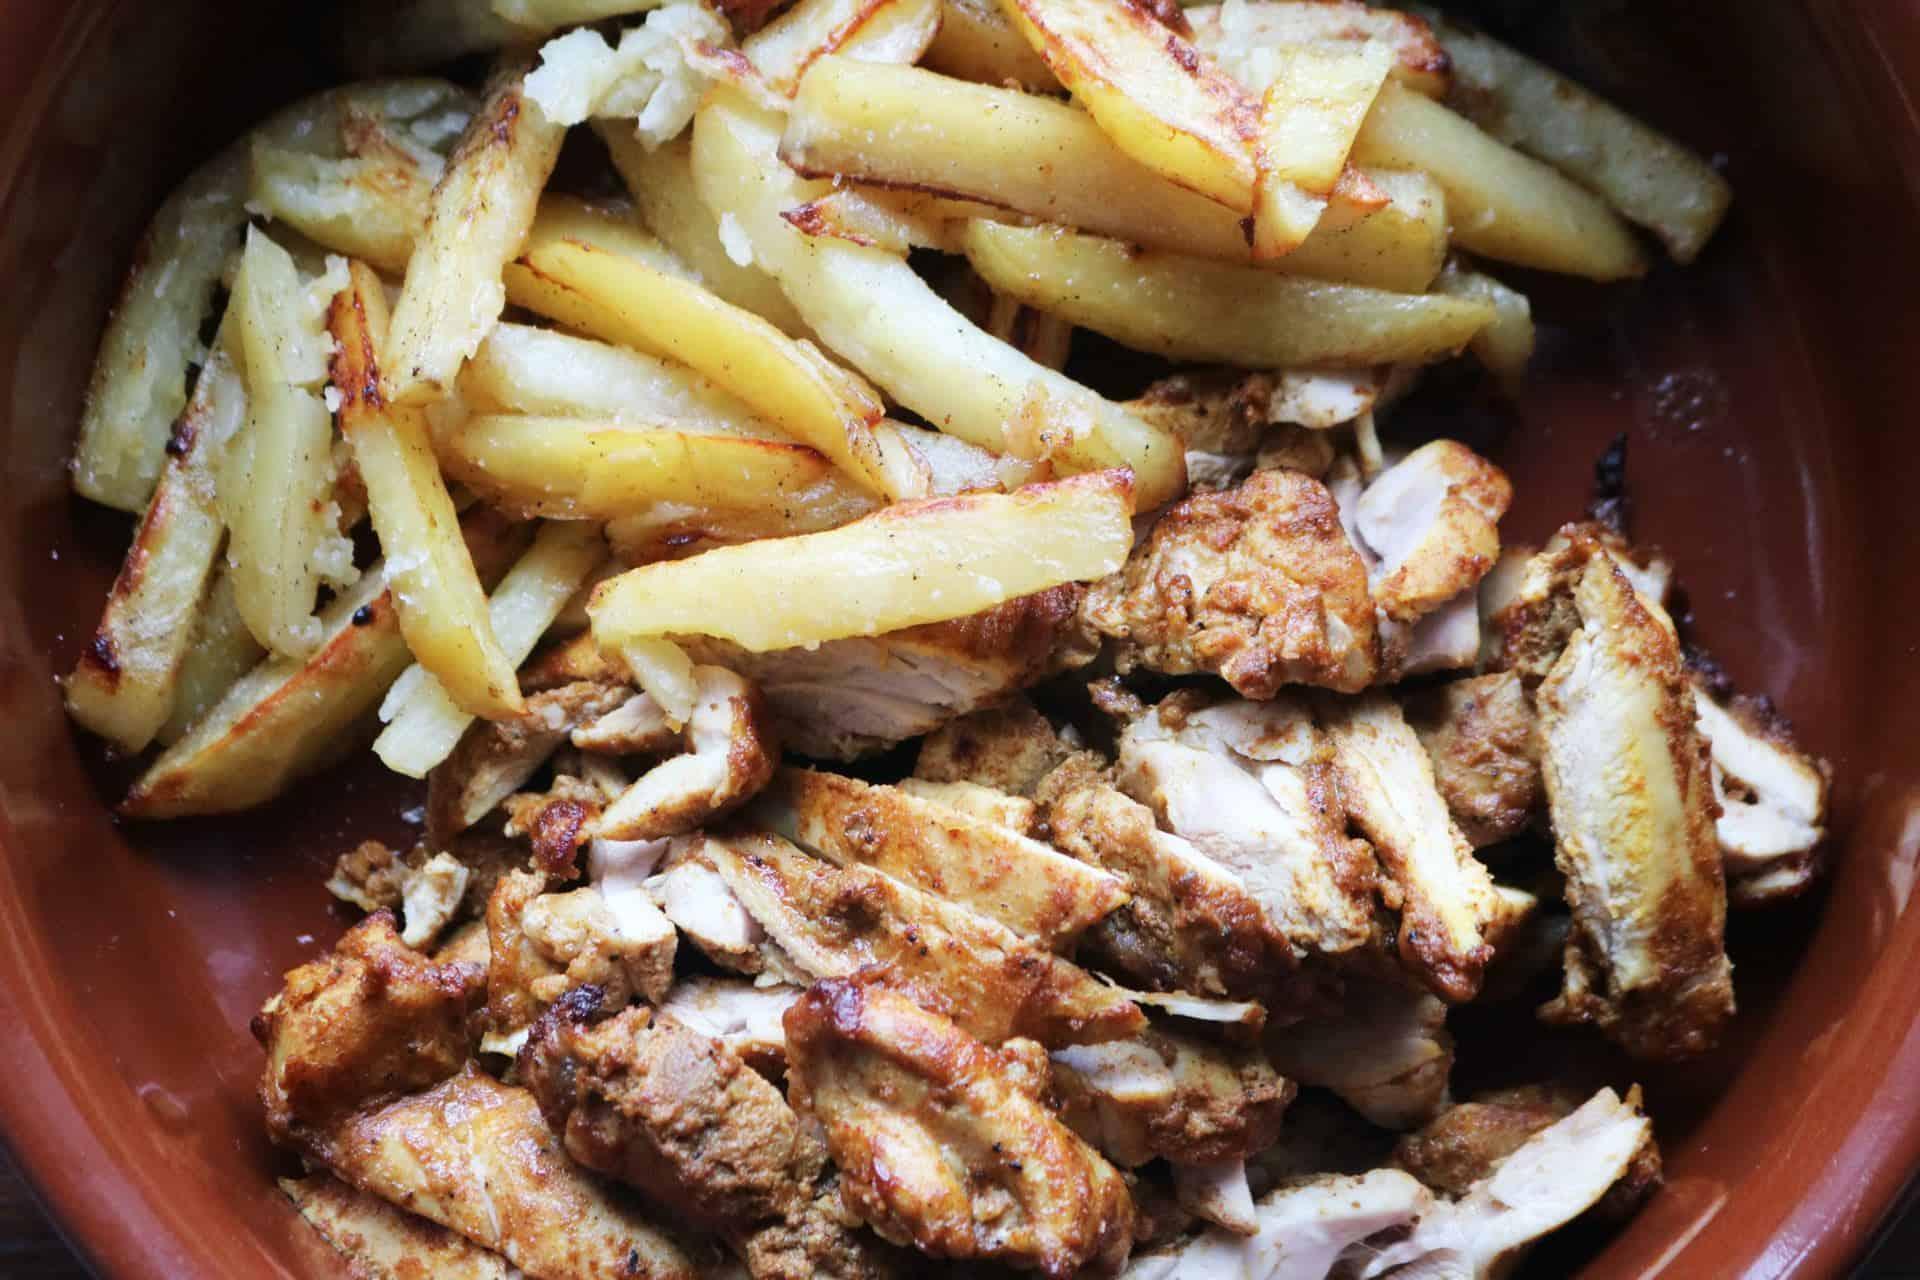 Kebab King Chicken Shawarma, Kebab King Chicken Shawarma